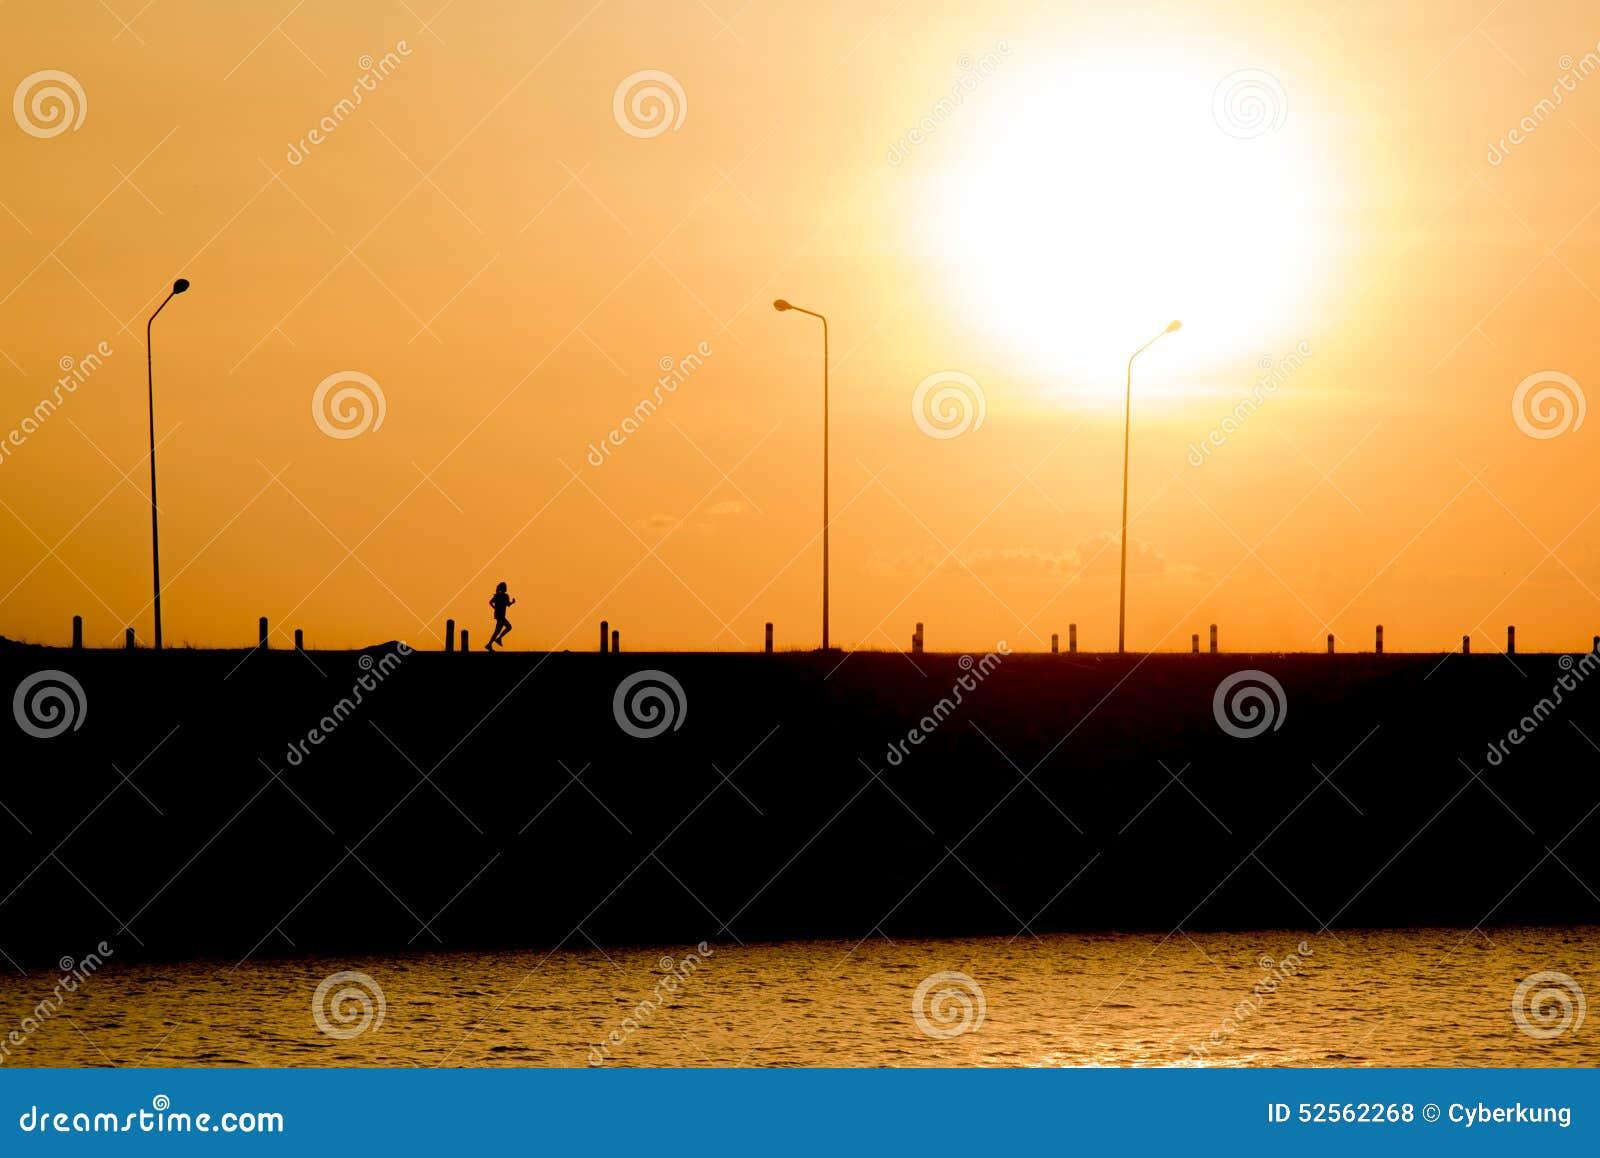 Frau läuft in Sonnenuntergang (Schattenbild)